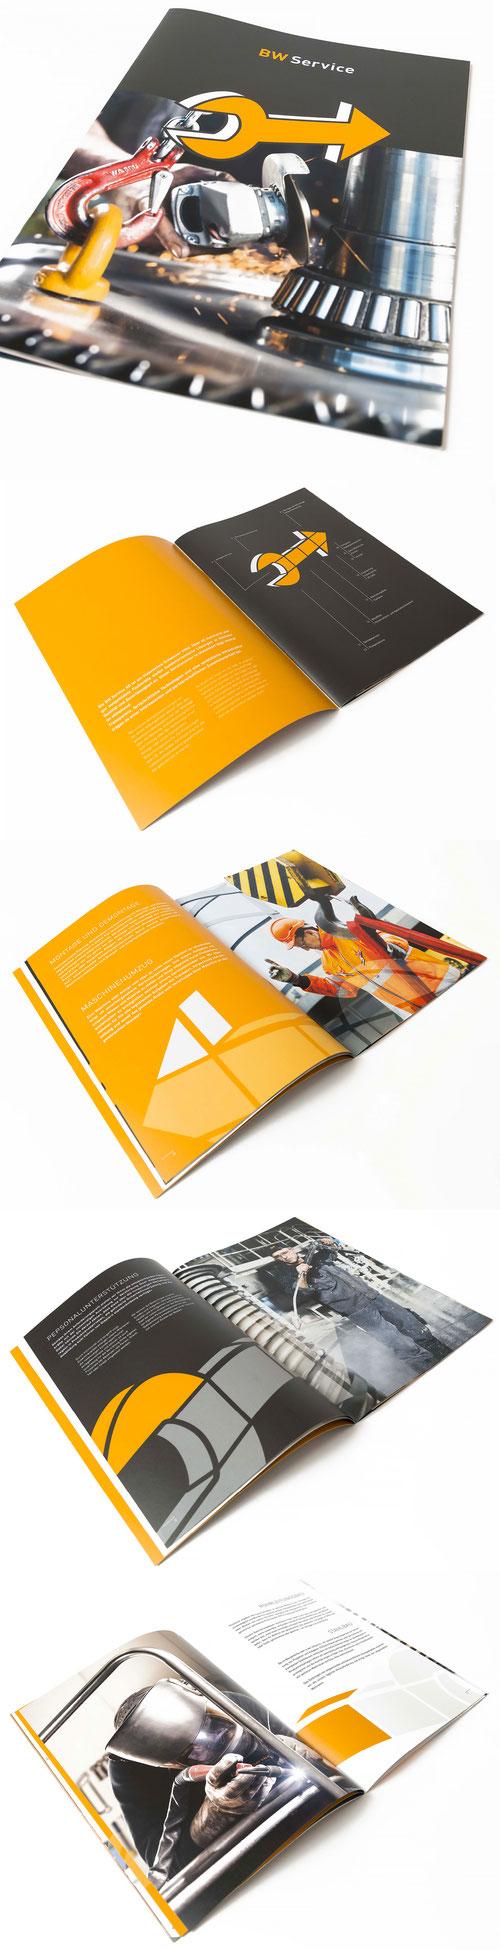 BW Service AG: Image Broschüre  | Lockedesign 2014